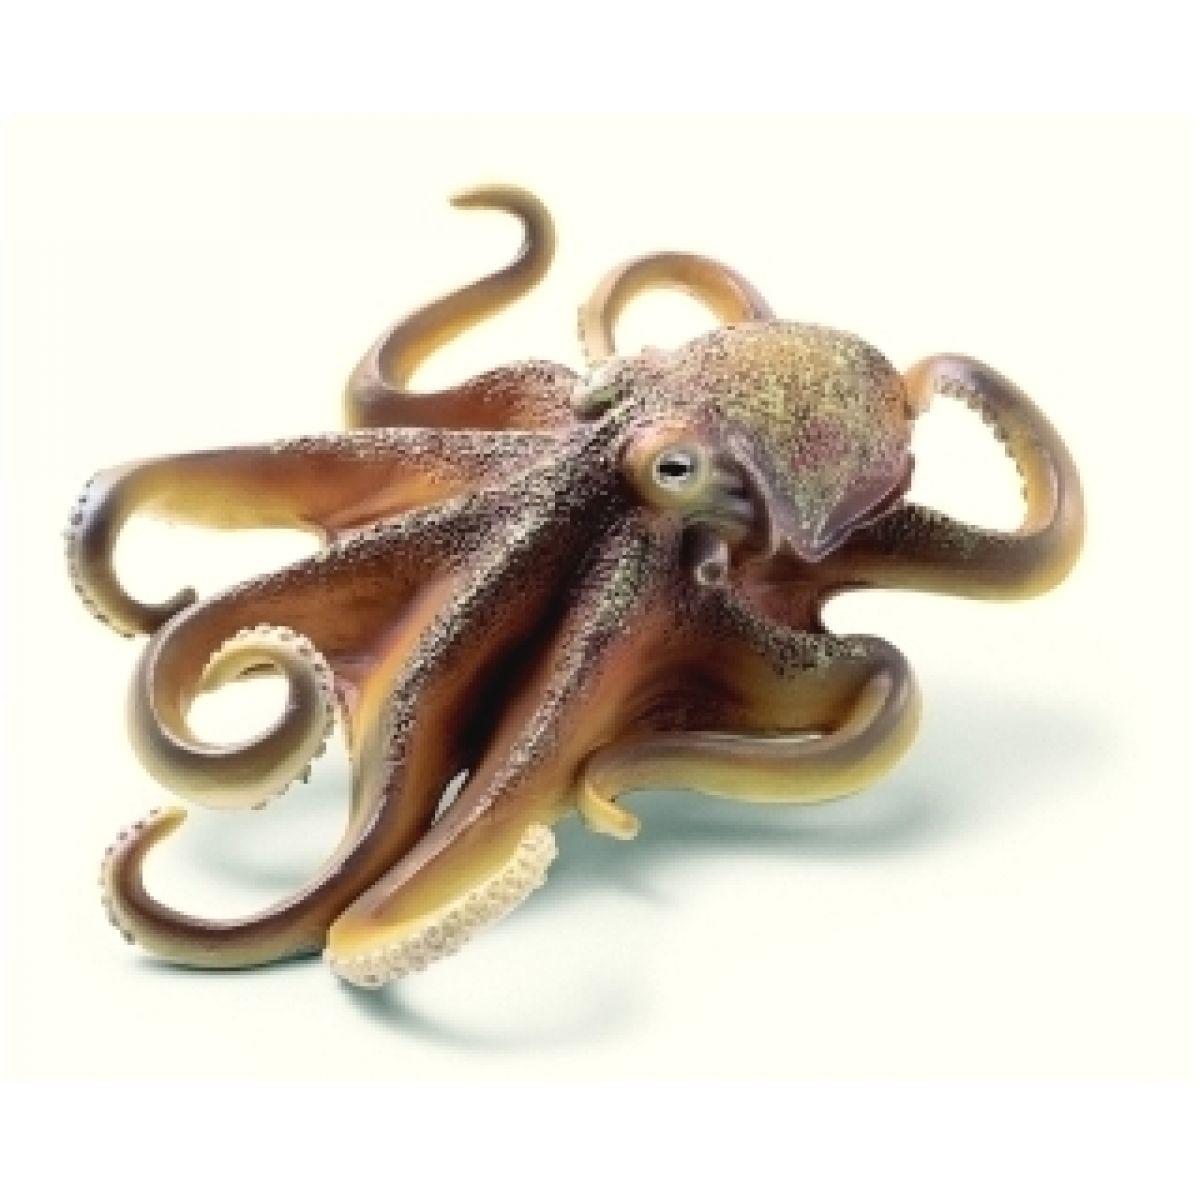 Schleich Chobotnice Krakatice